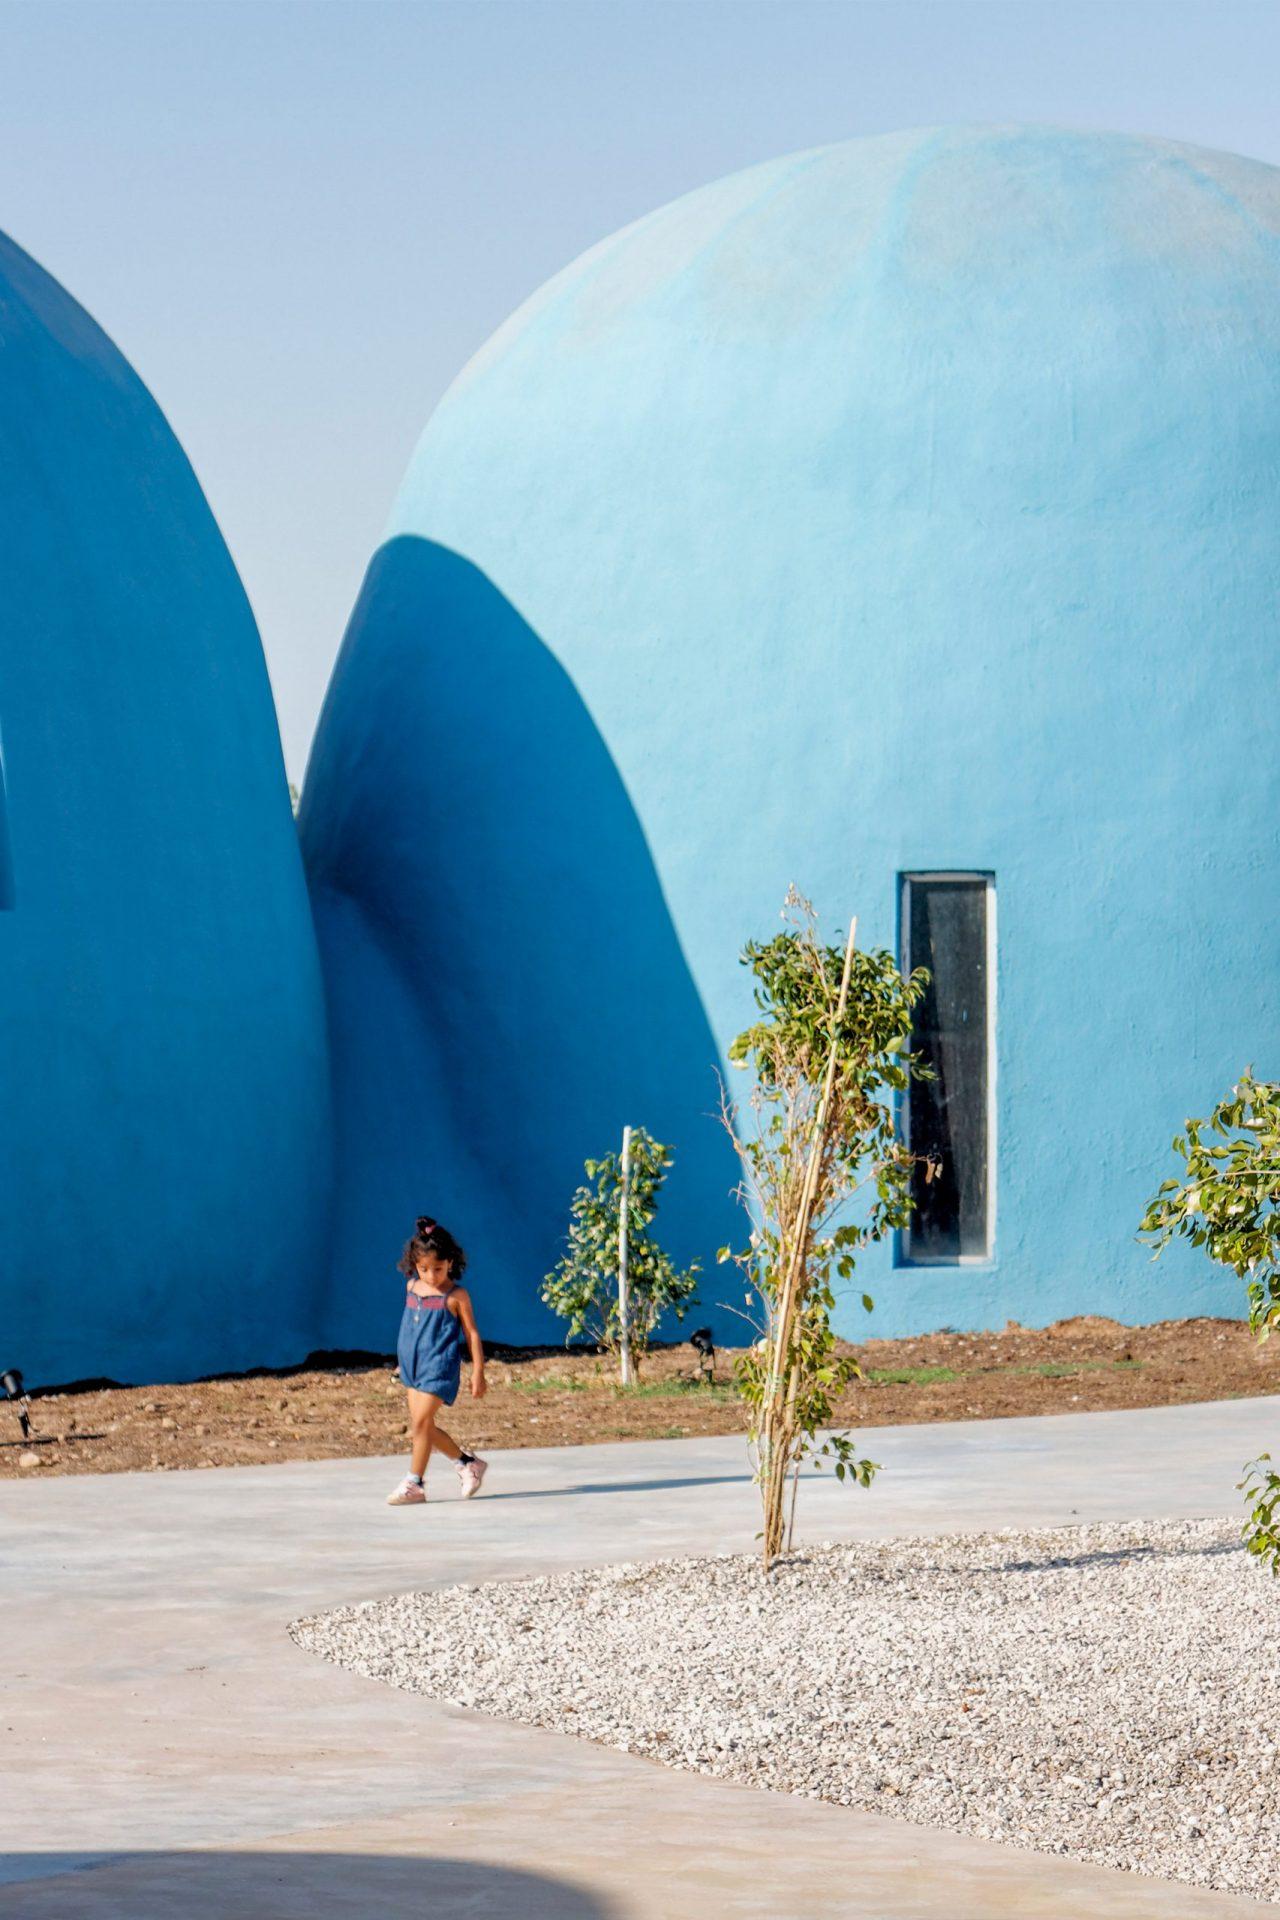 zav_architects_iran_hormuz_island_designalive-6